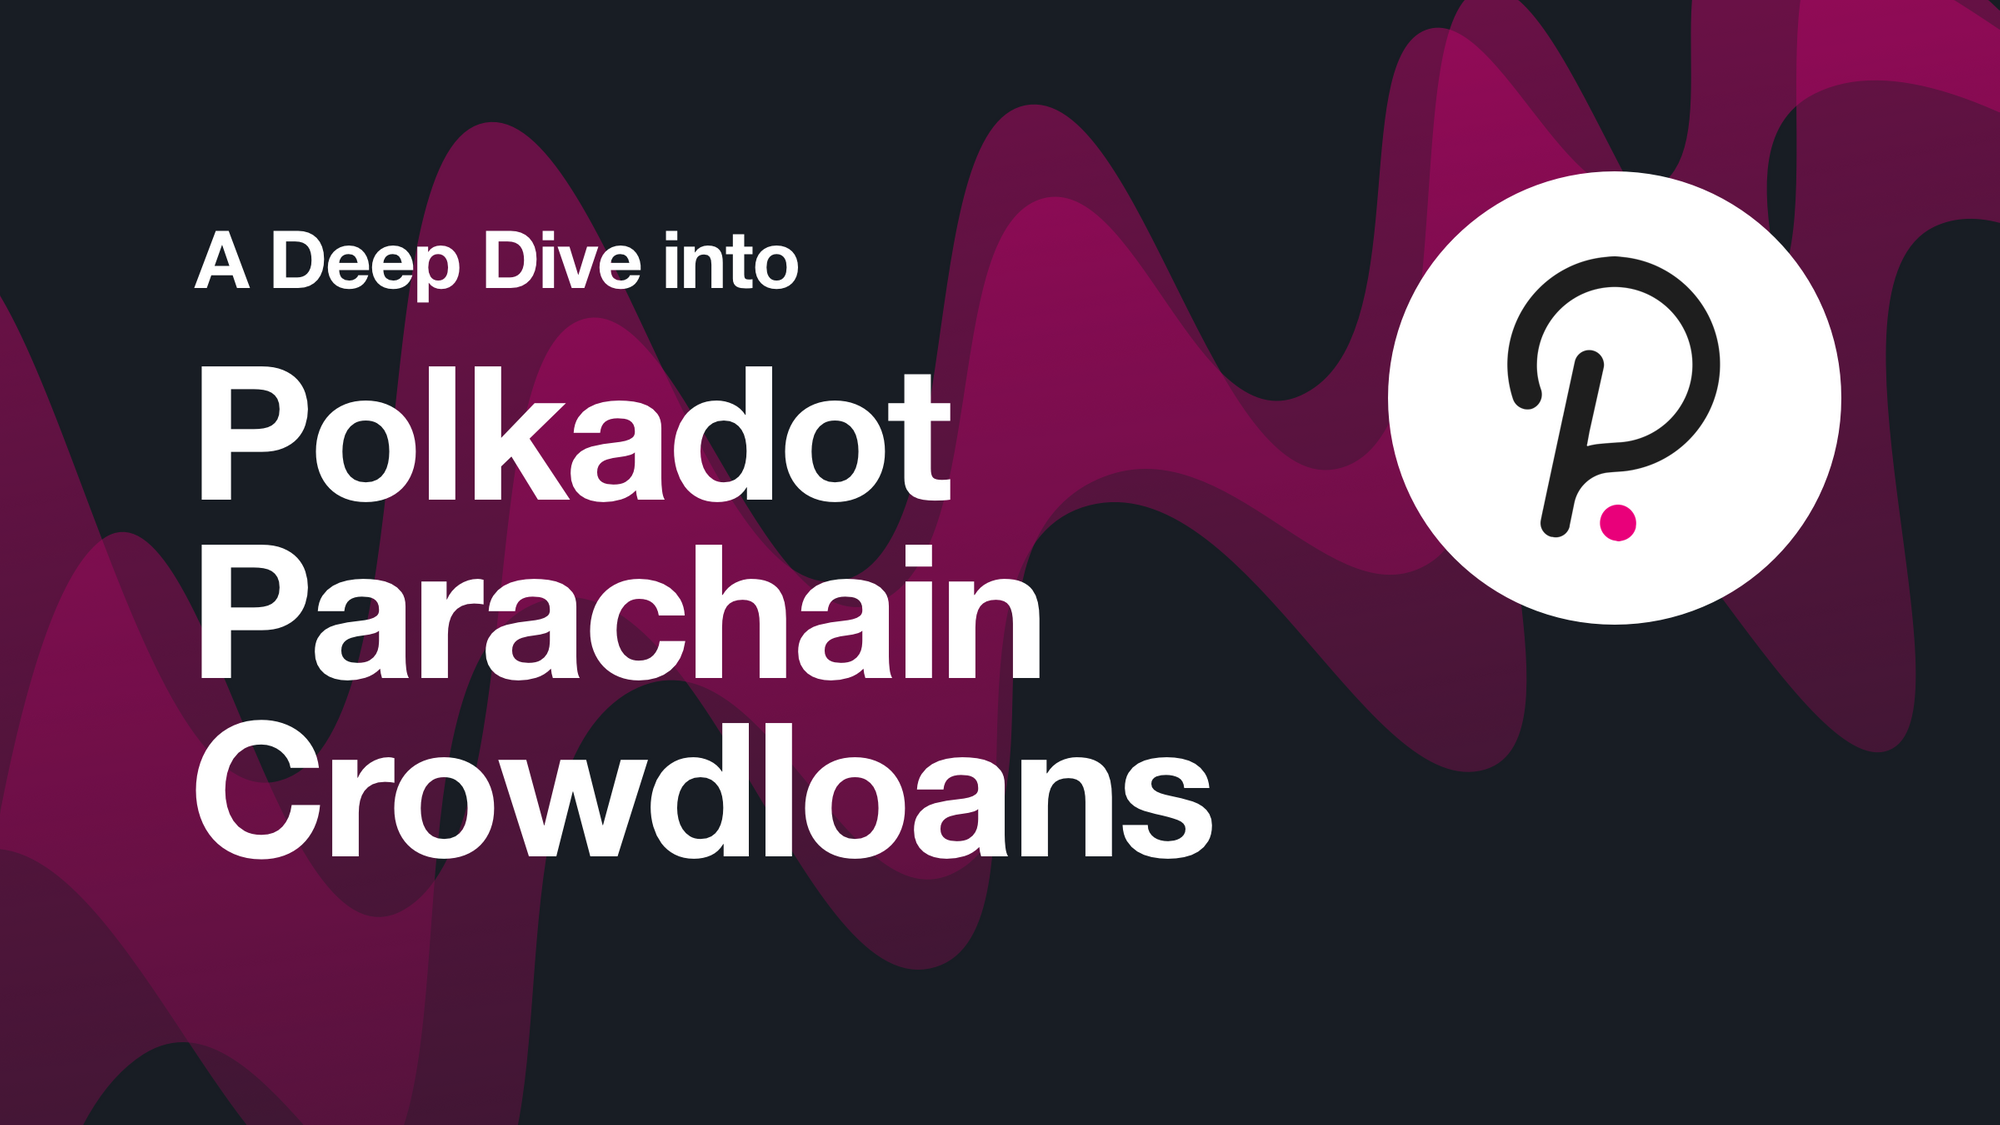 [Coinlist] 🔎 A Deep Dive Into Polkadot's Parachain Auctions and Crowdloans - AZCoin News